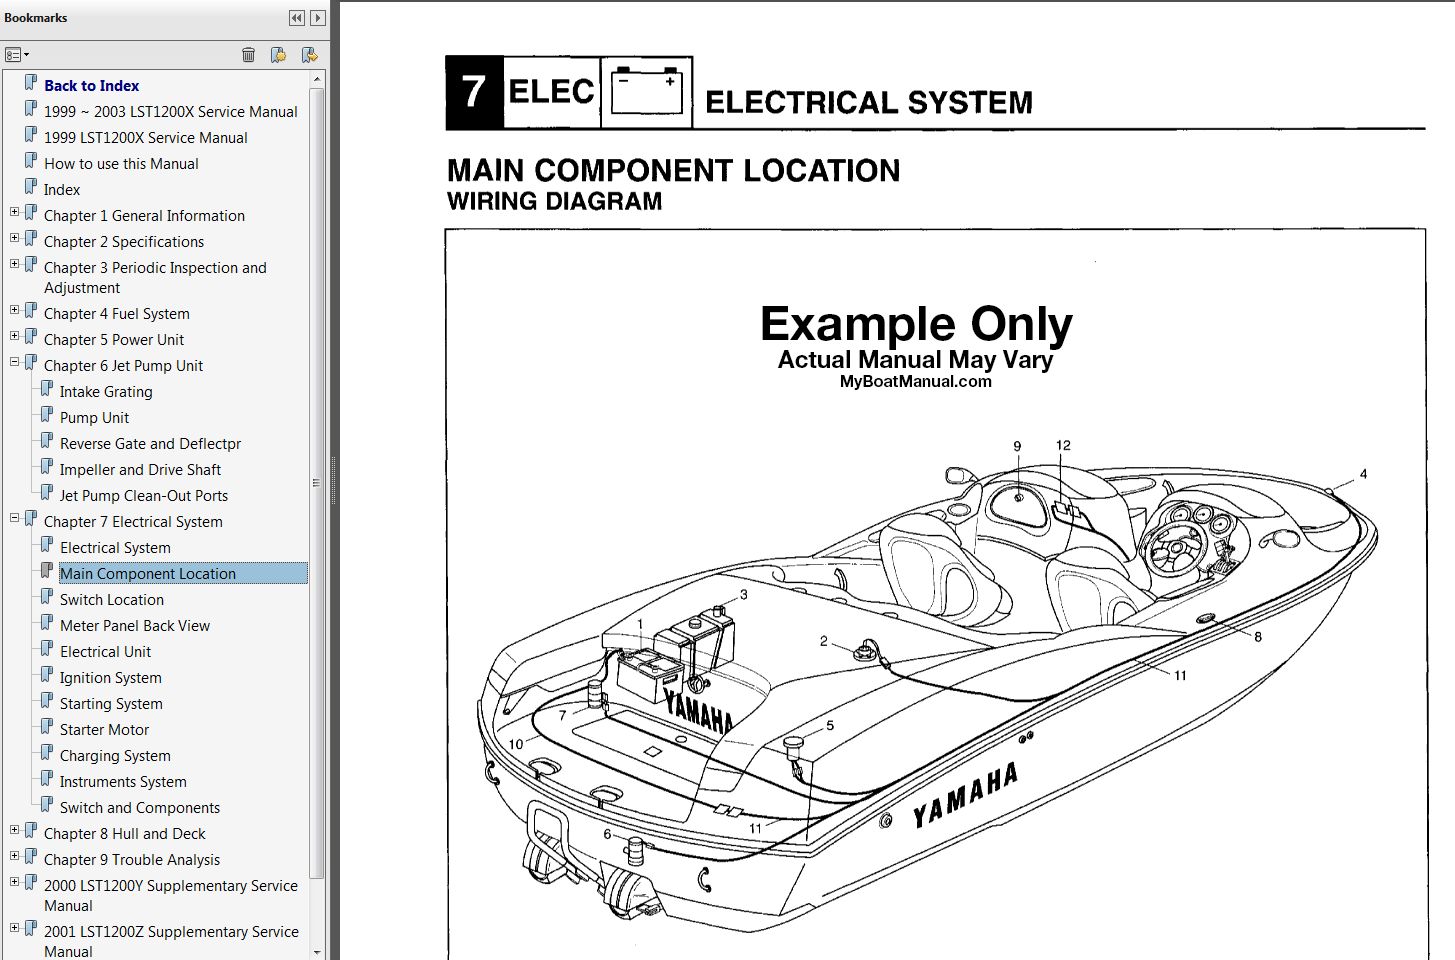 sample1 Yamaha Ls Wiring Diagram on ls inverter diagram, 2002 lincoln ls diagram, ls wiring harness modification, 2005 lincoln ls engine diagram,